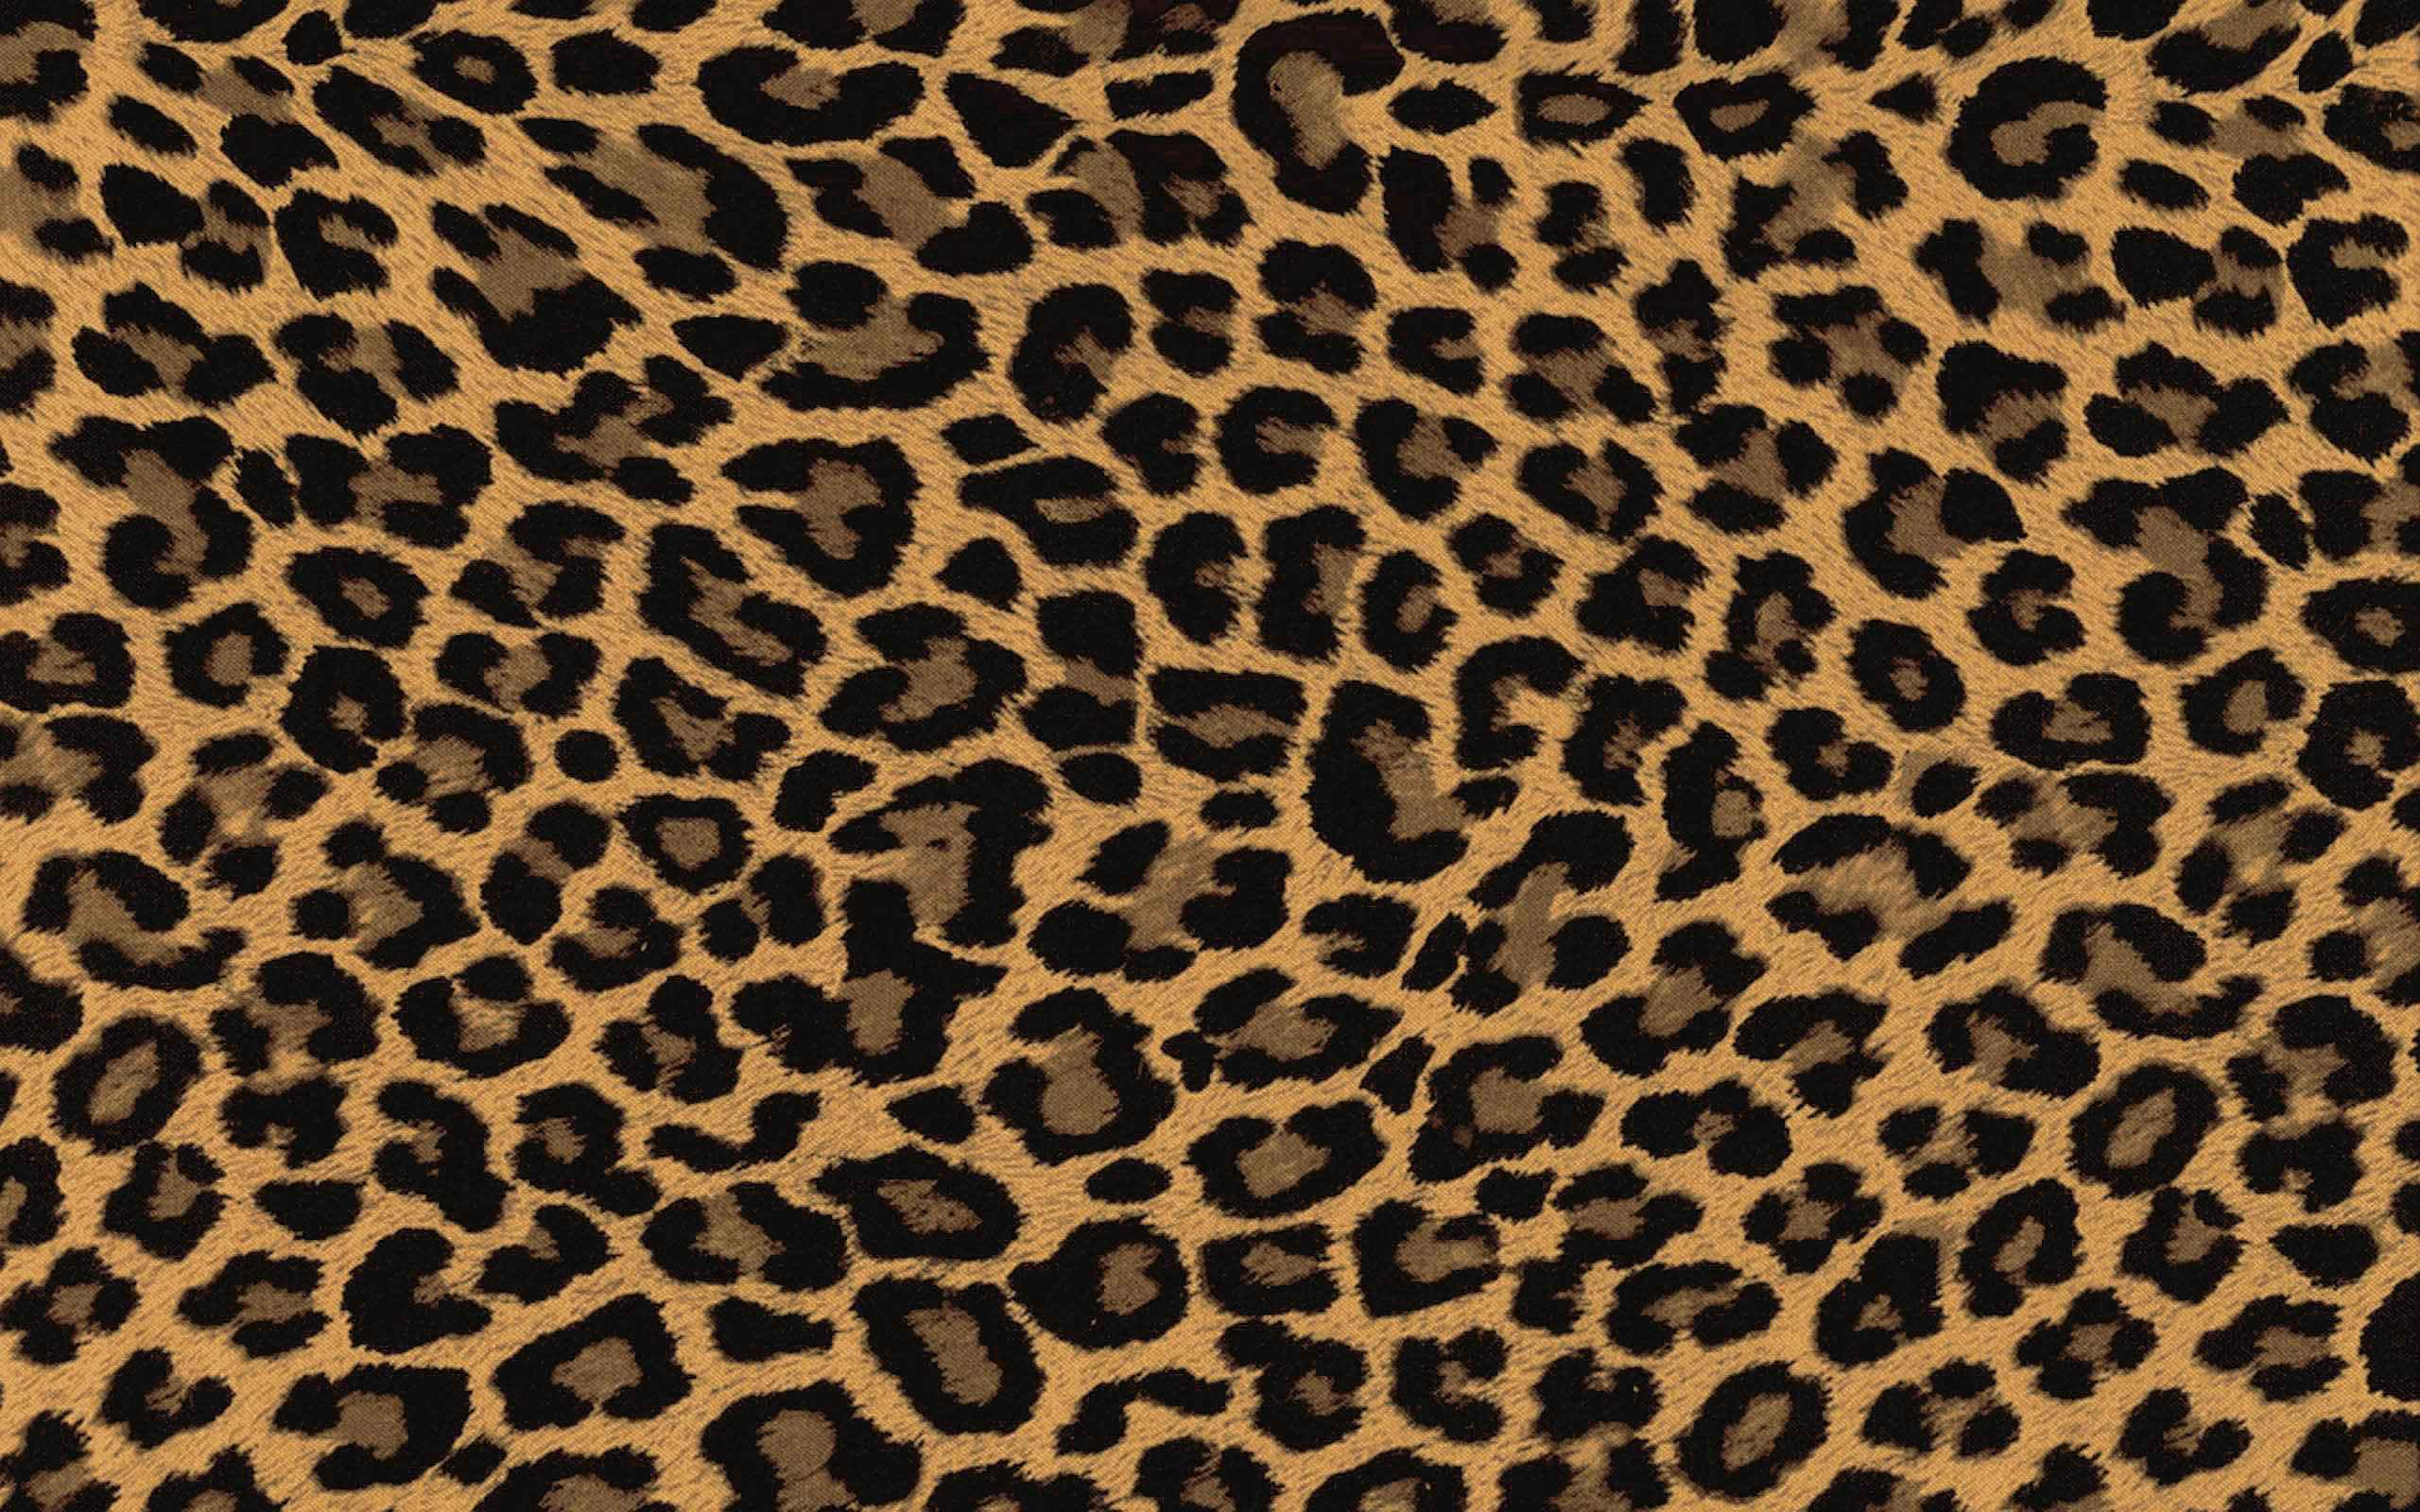 Pink Leopard Print Wallpapers - Wallpaper Cave